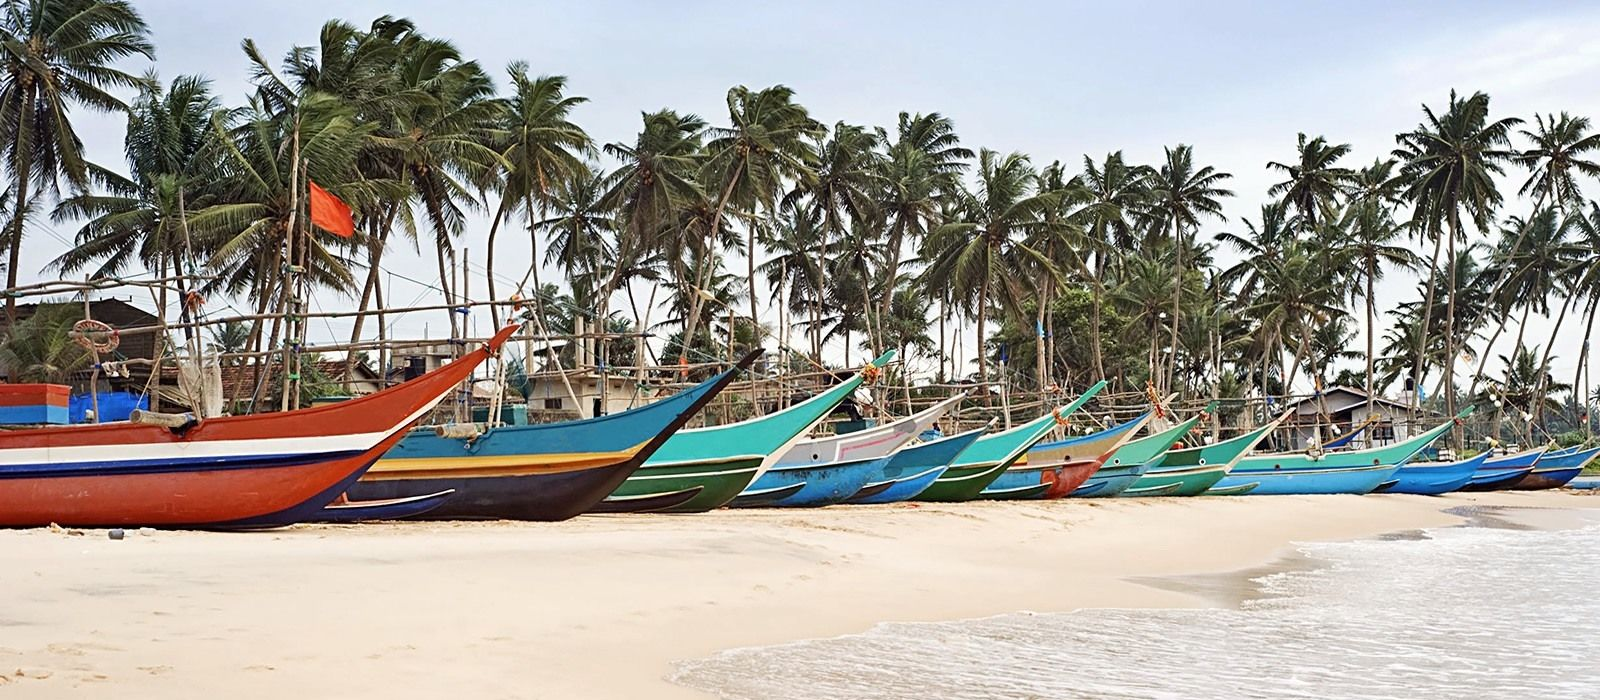 Ancient Wonders & Beaches of Sri Lanka Tour Trip 4